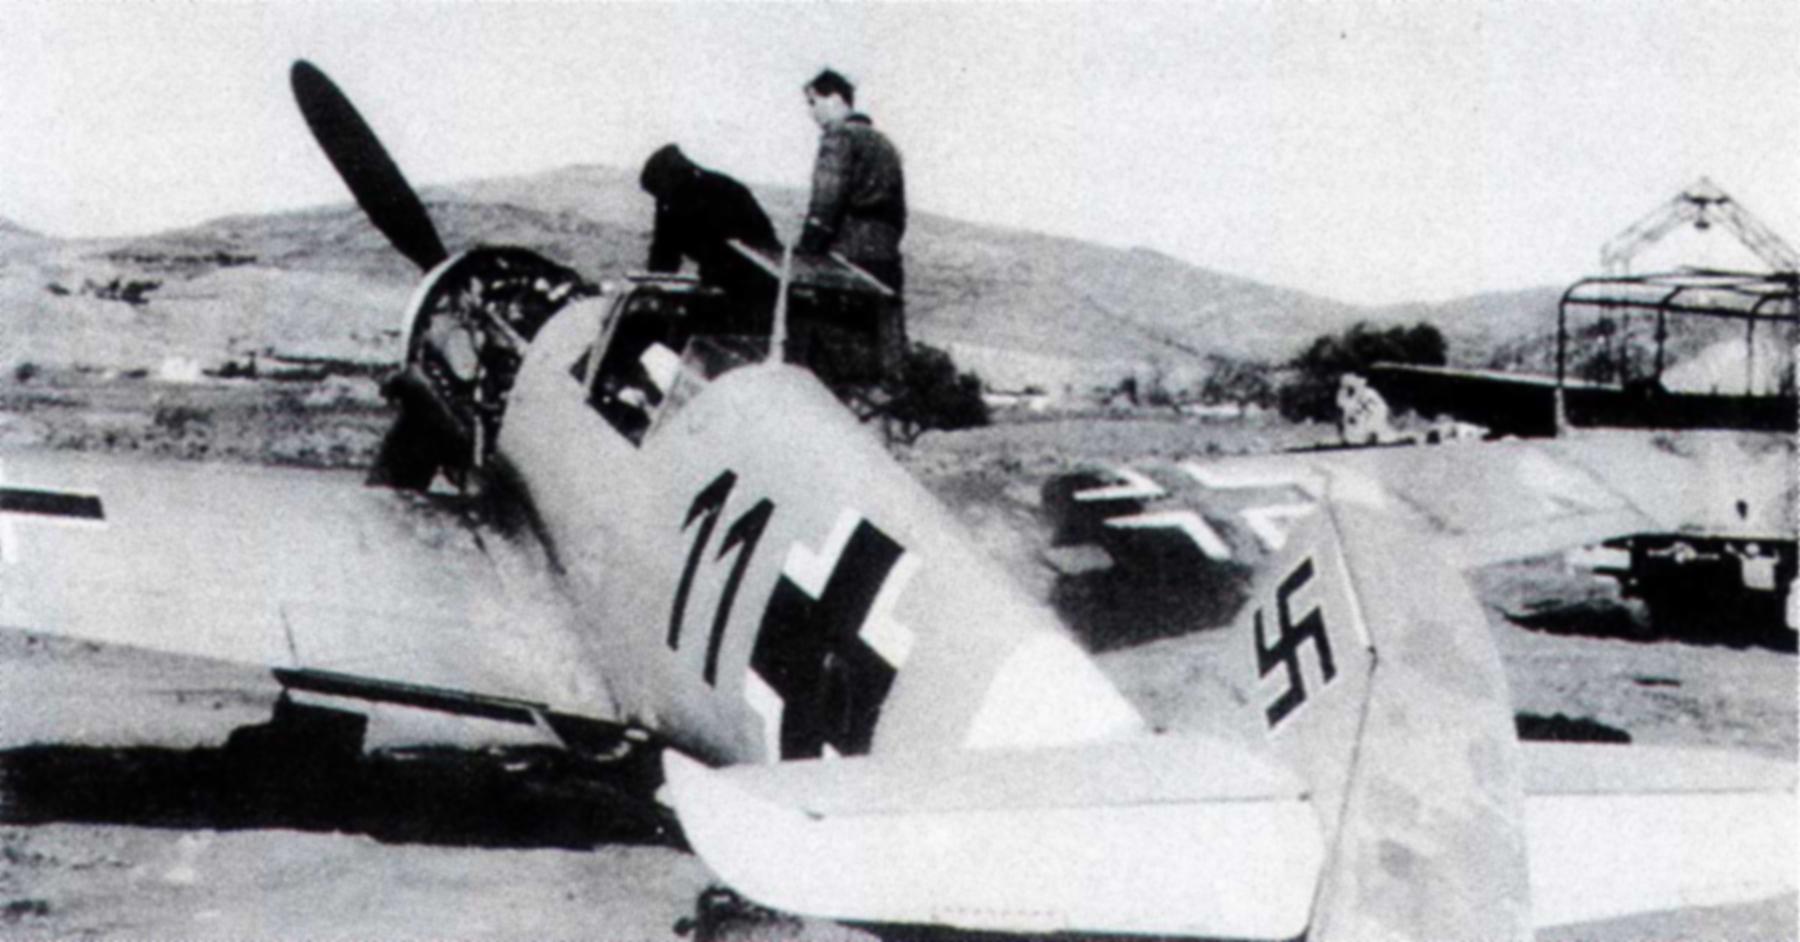 Messerschmitt Bf 109F4Trop 2.JG27 Black 11 WNr 7510F Crete Greece 1943 01